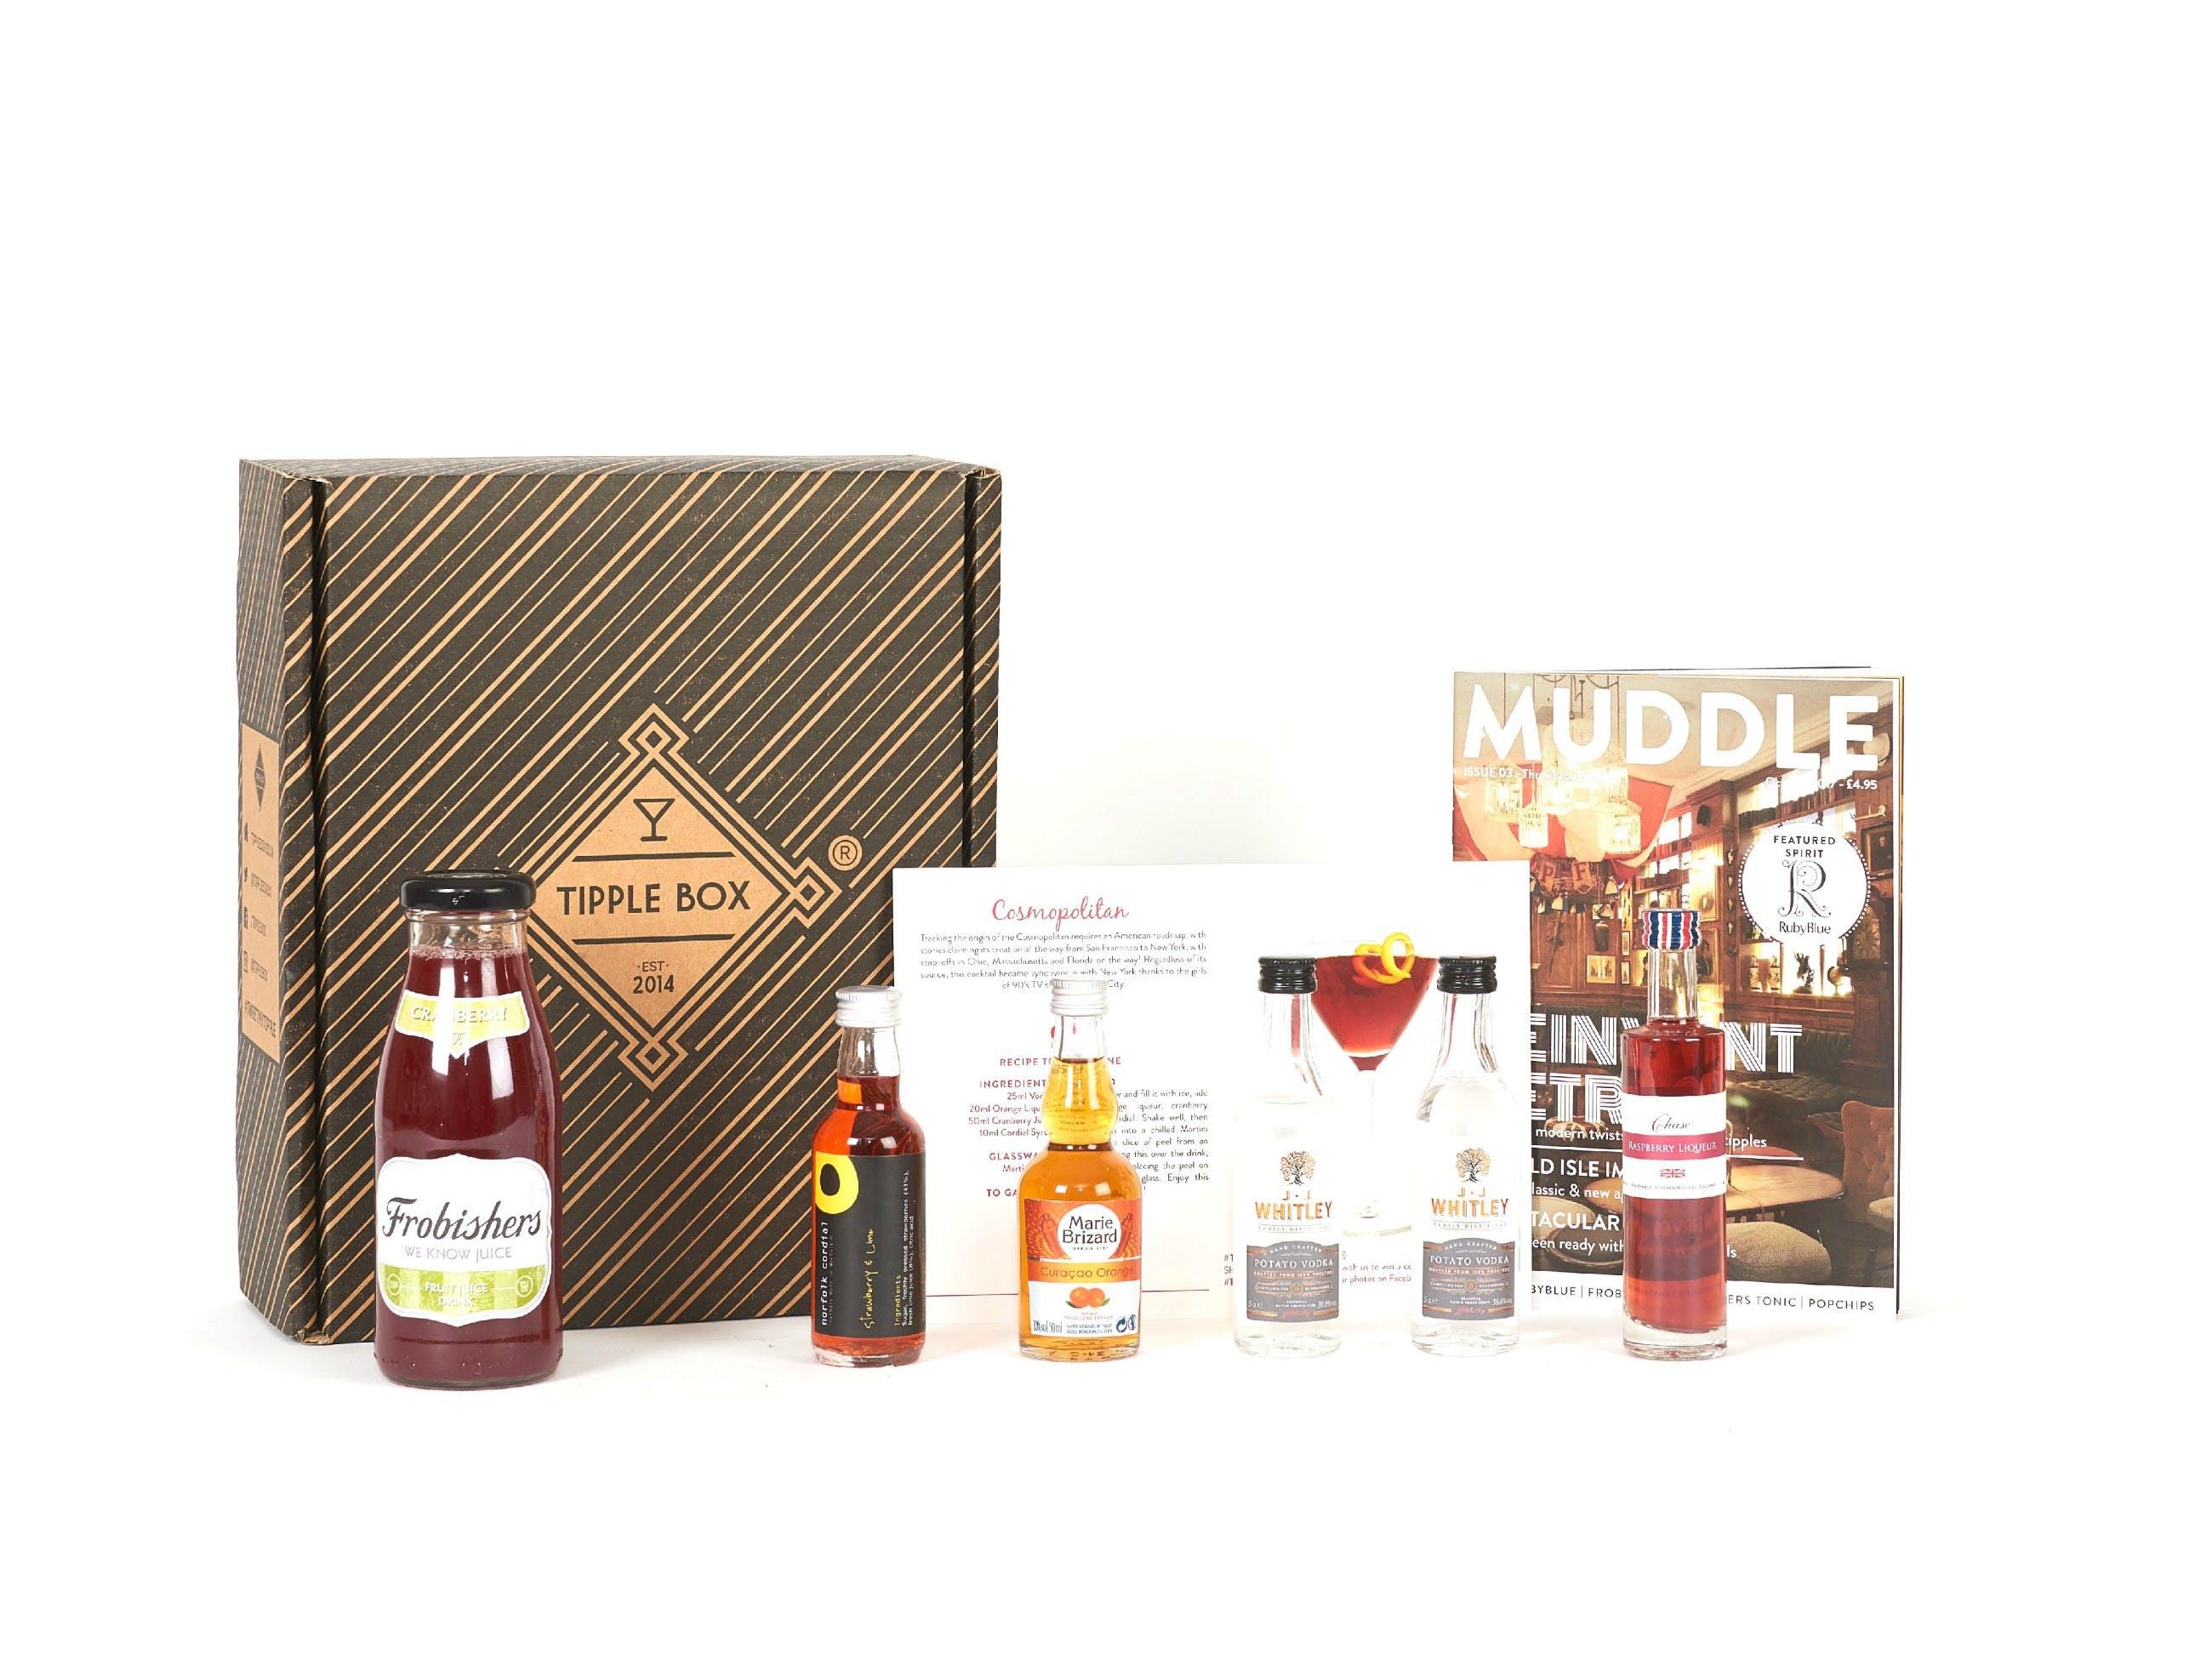 Tipple Box - Cosmopolitan Cocktail Set